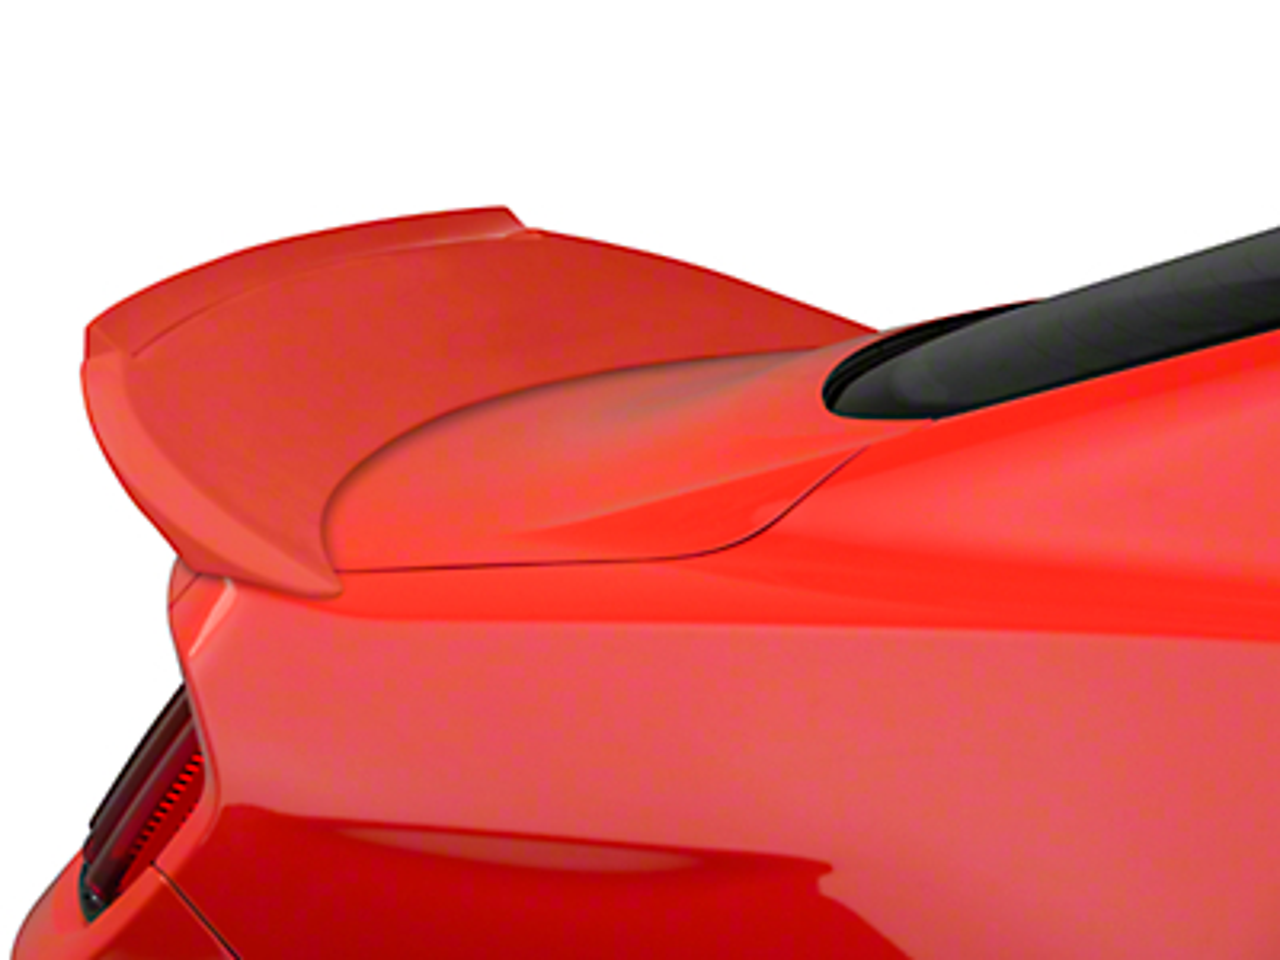 Trufiber Fiberglass Rear Spoiler w/ Gurney Flap - Unpainted (15-18 Fastback)